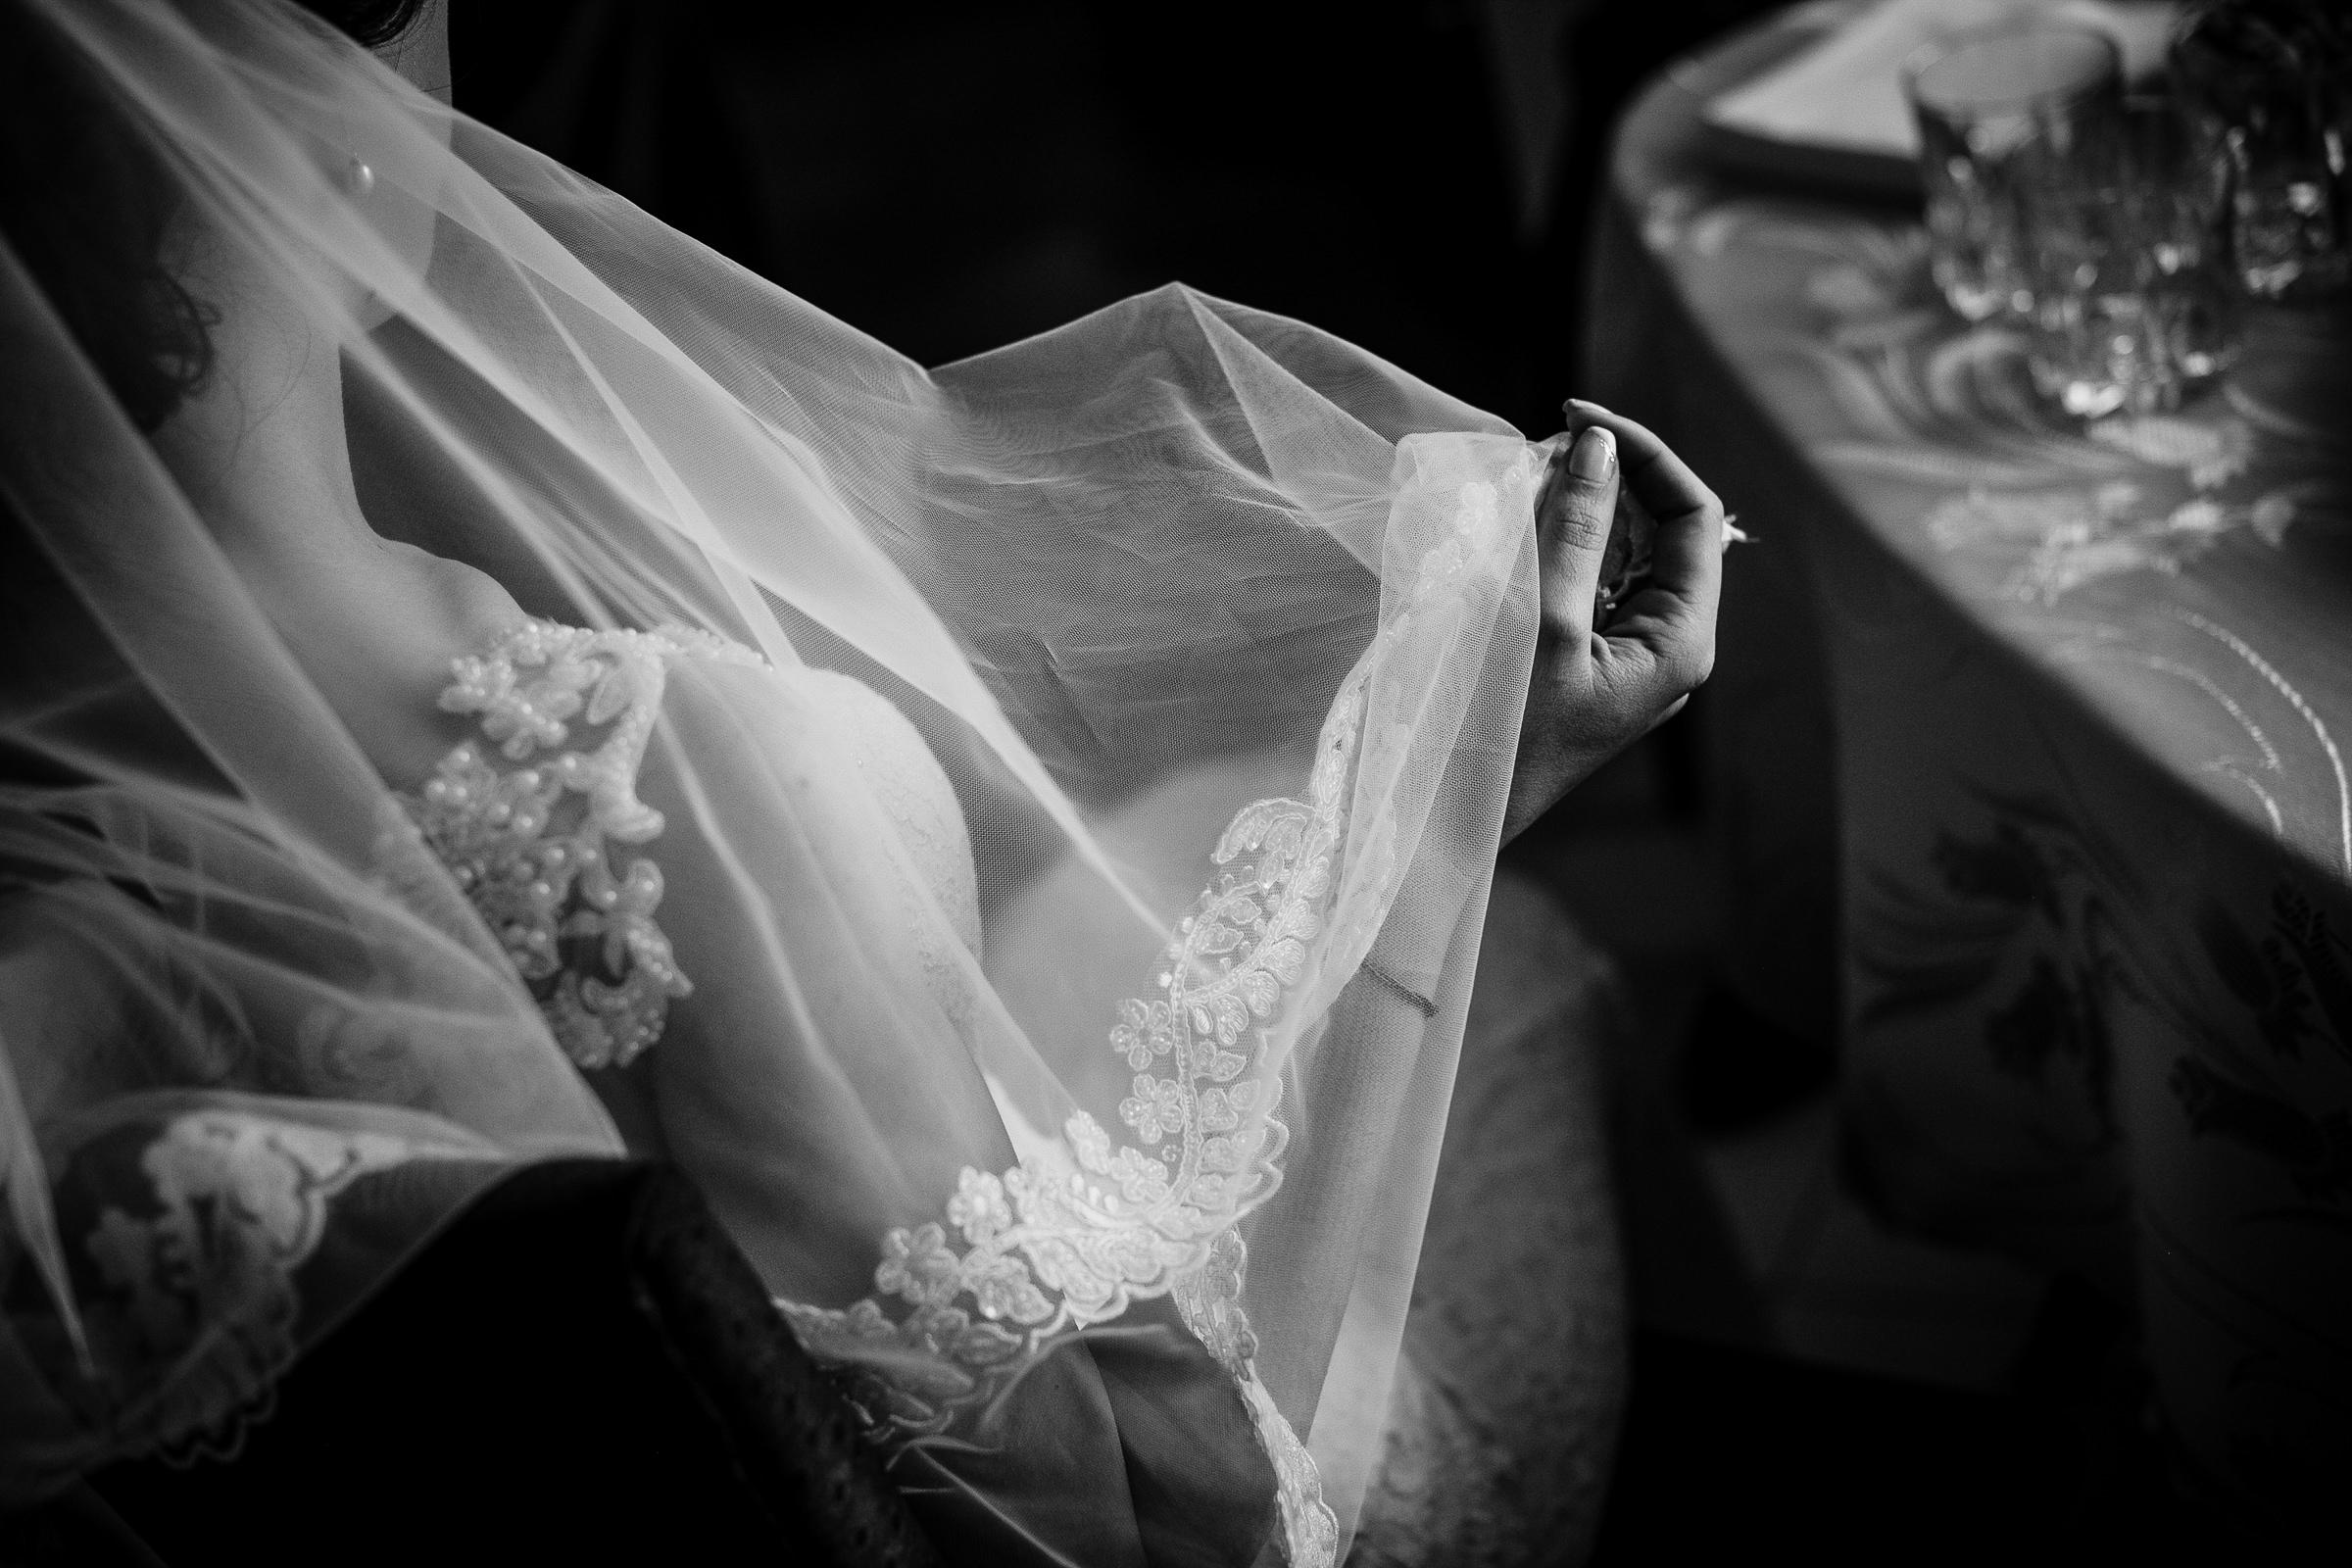 Detail of bride putting on veil - photo by Deliysky Studio